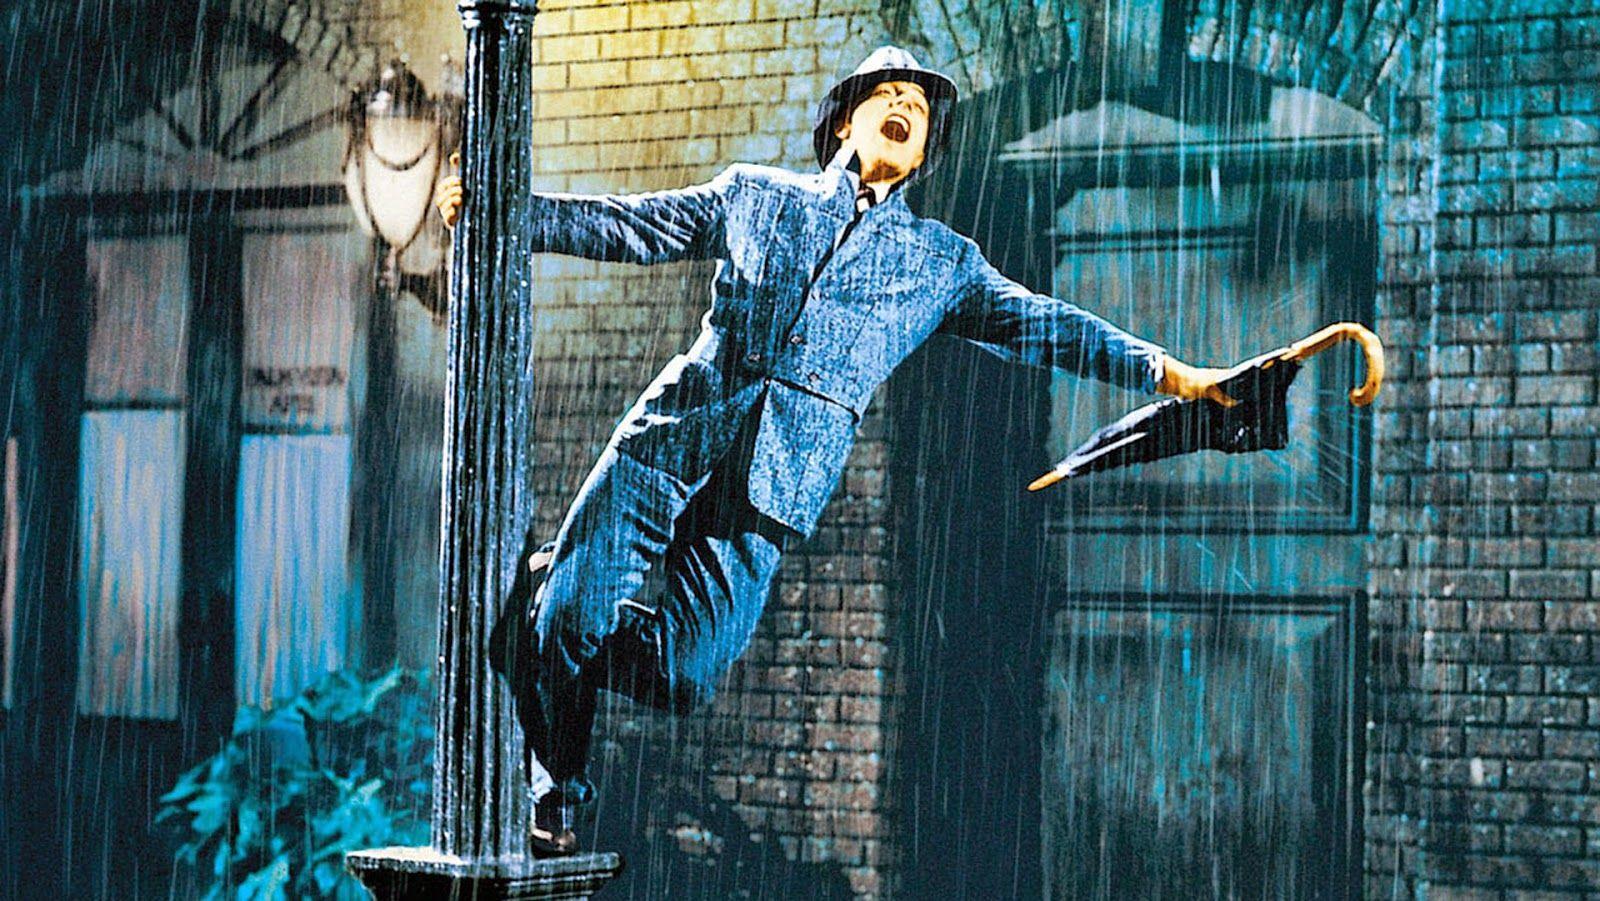 Daftar 20 Film Terbaik Dunia Tahun 50an Gene kelly